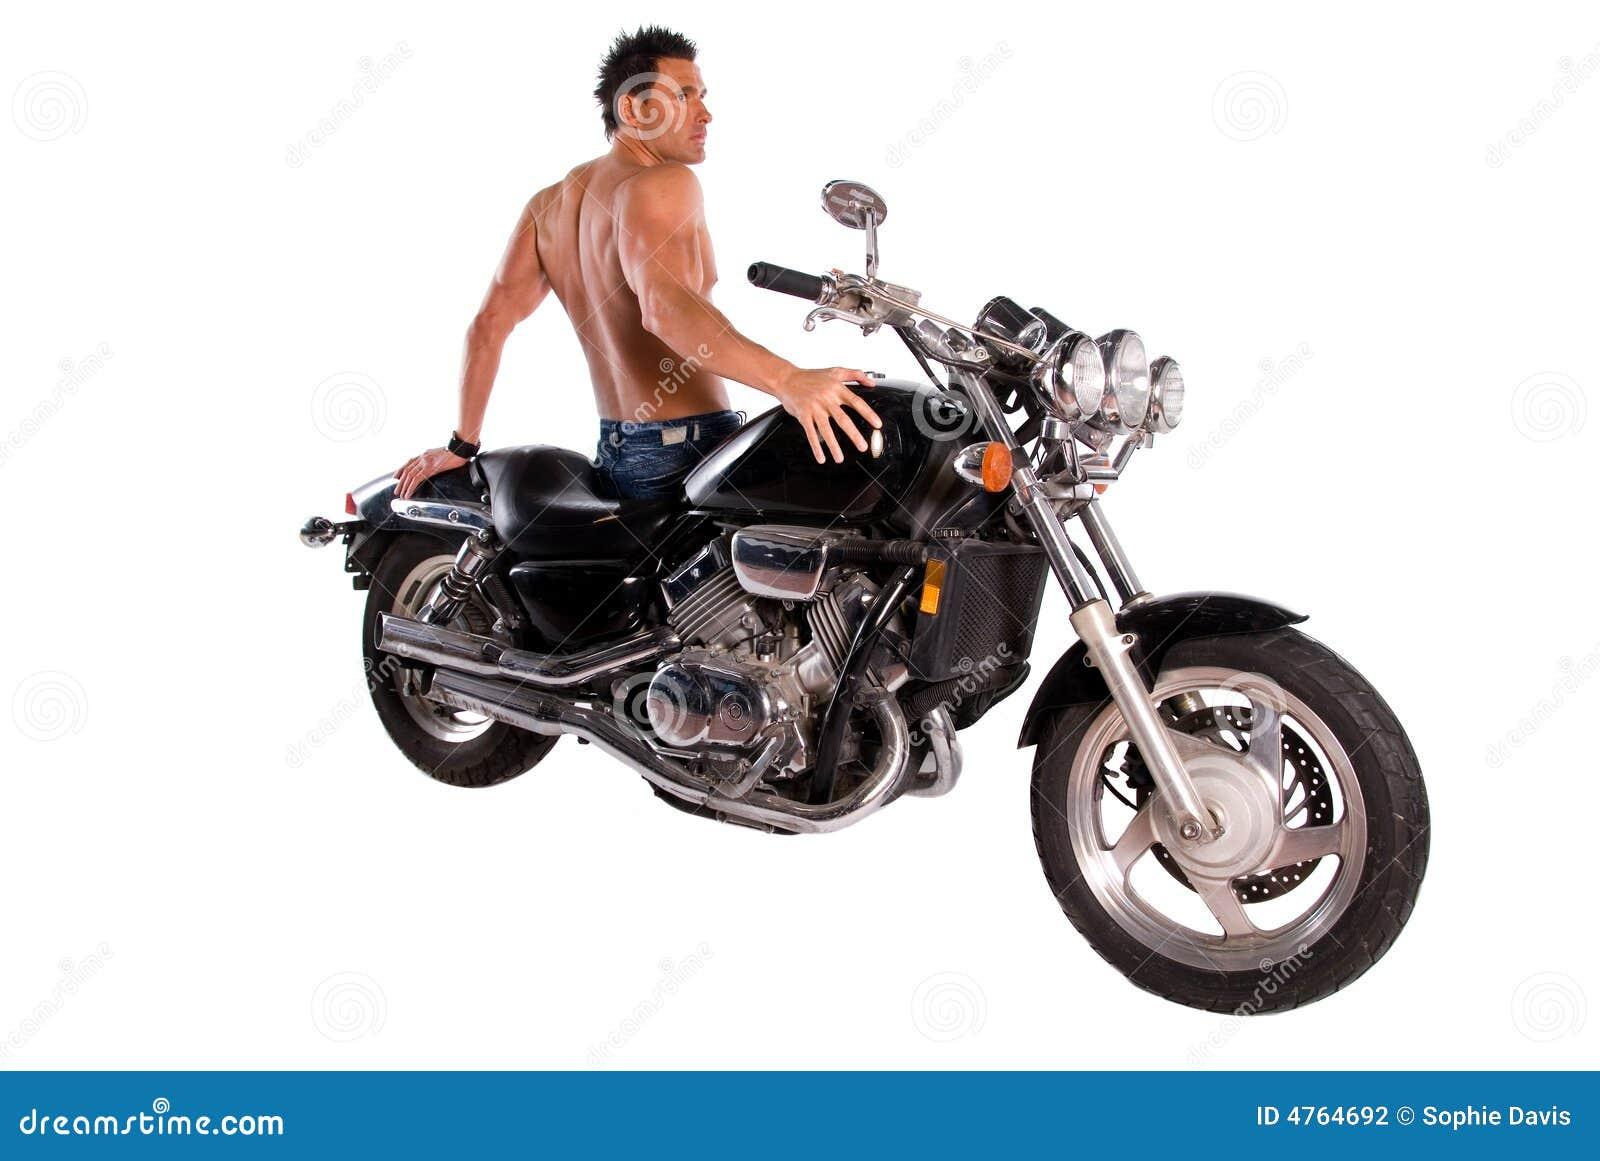 Homme Sexy Harley Davidson